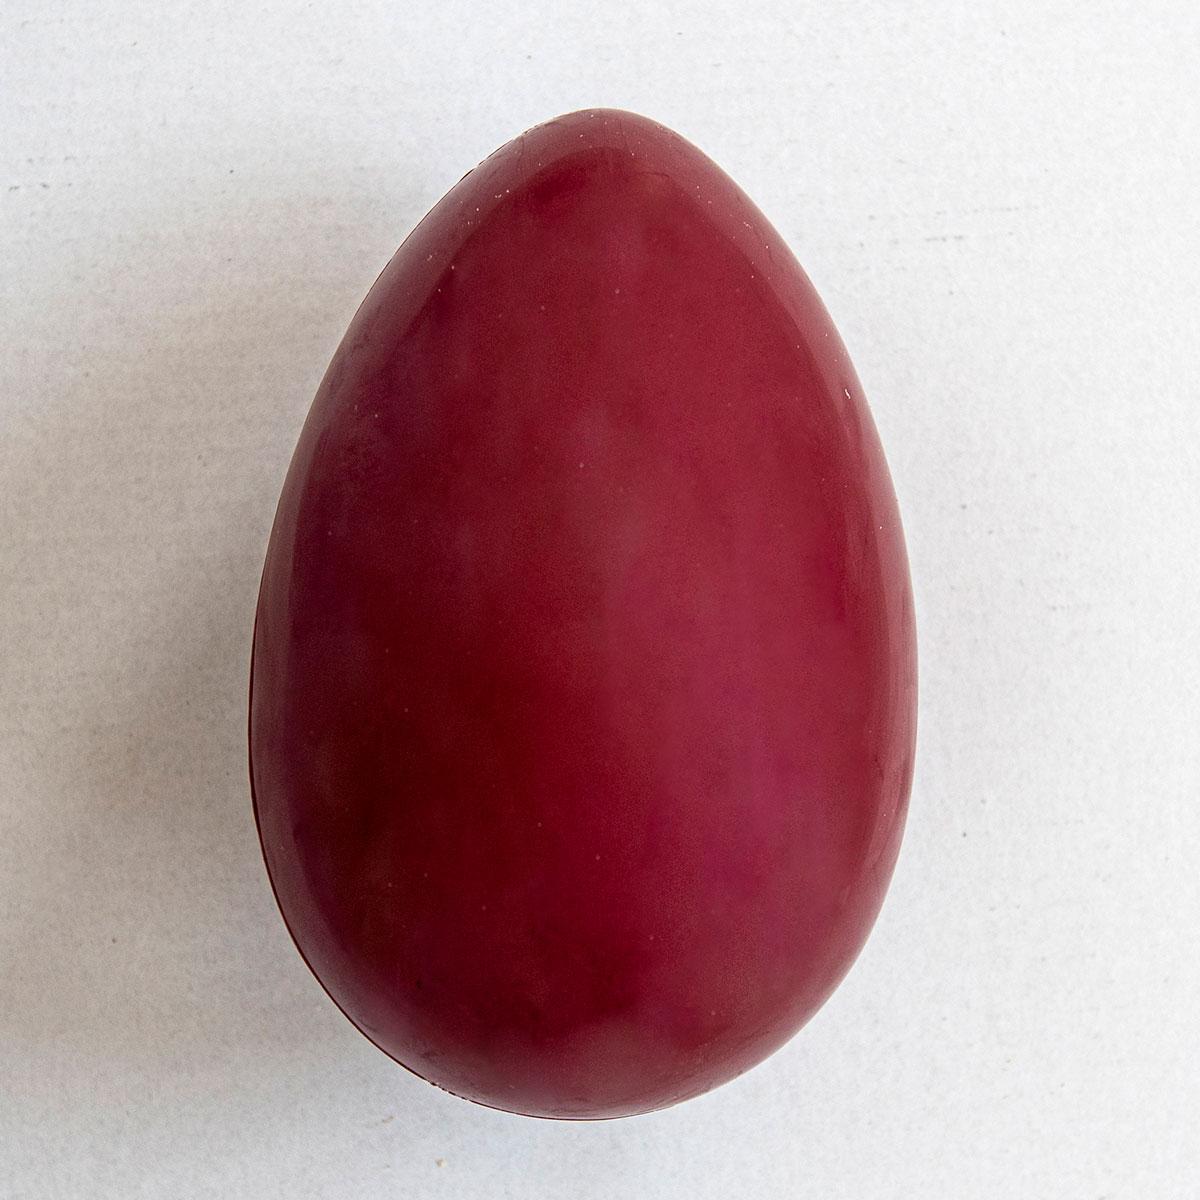 Uova artigianali Pasqua cioccolato Valrhona